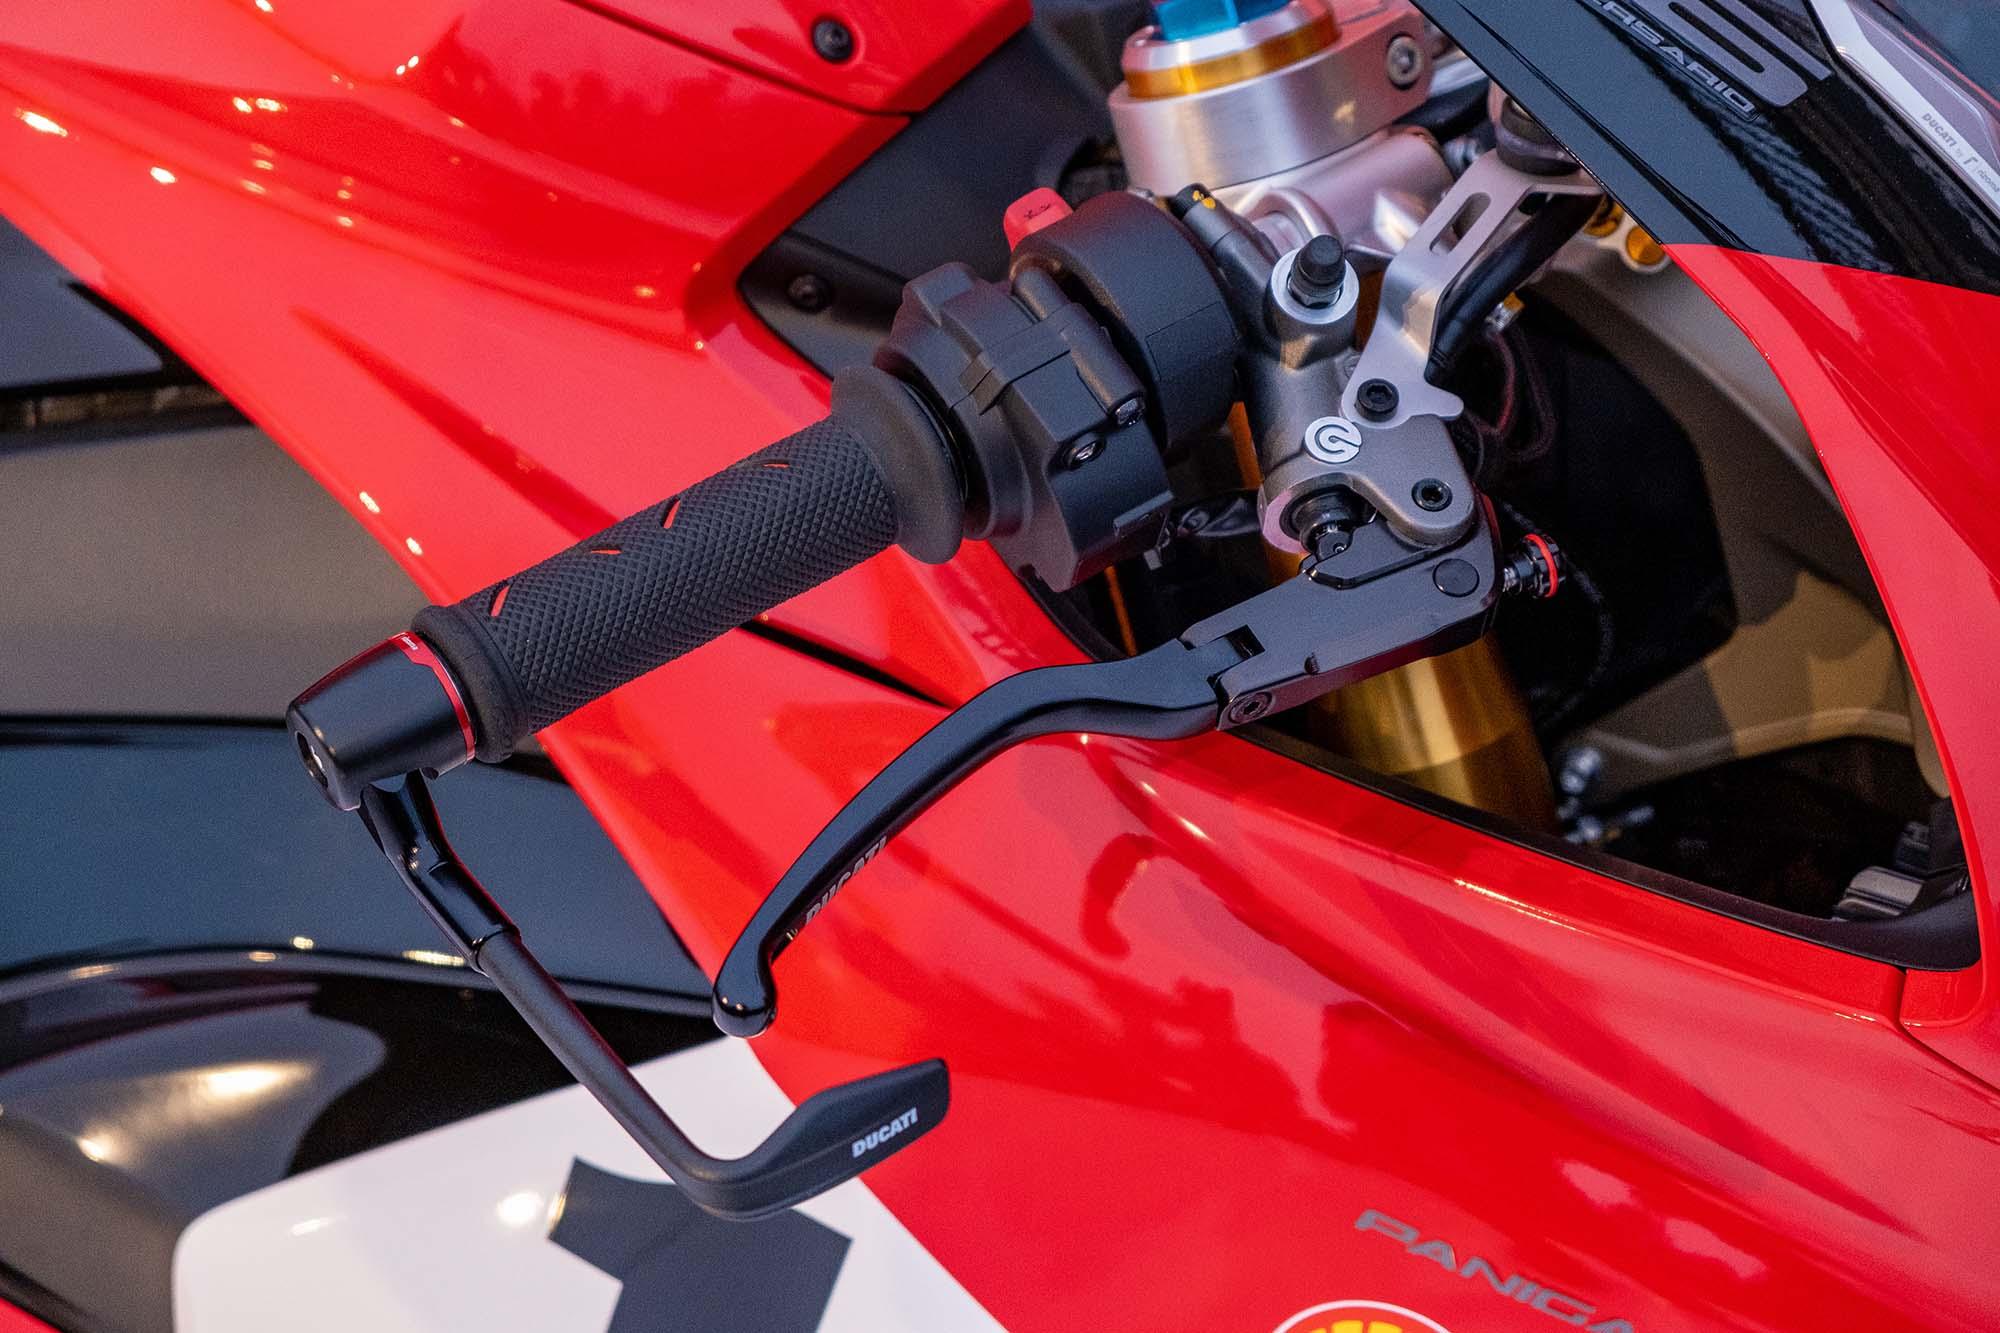 Ducati-Panigale-V4-25th-Anniversary-916-